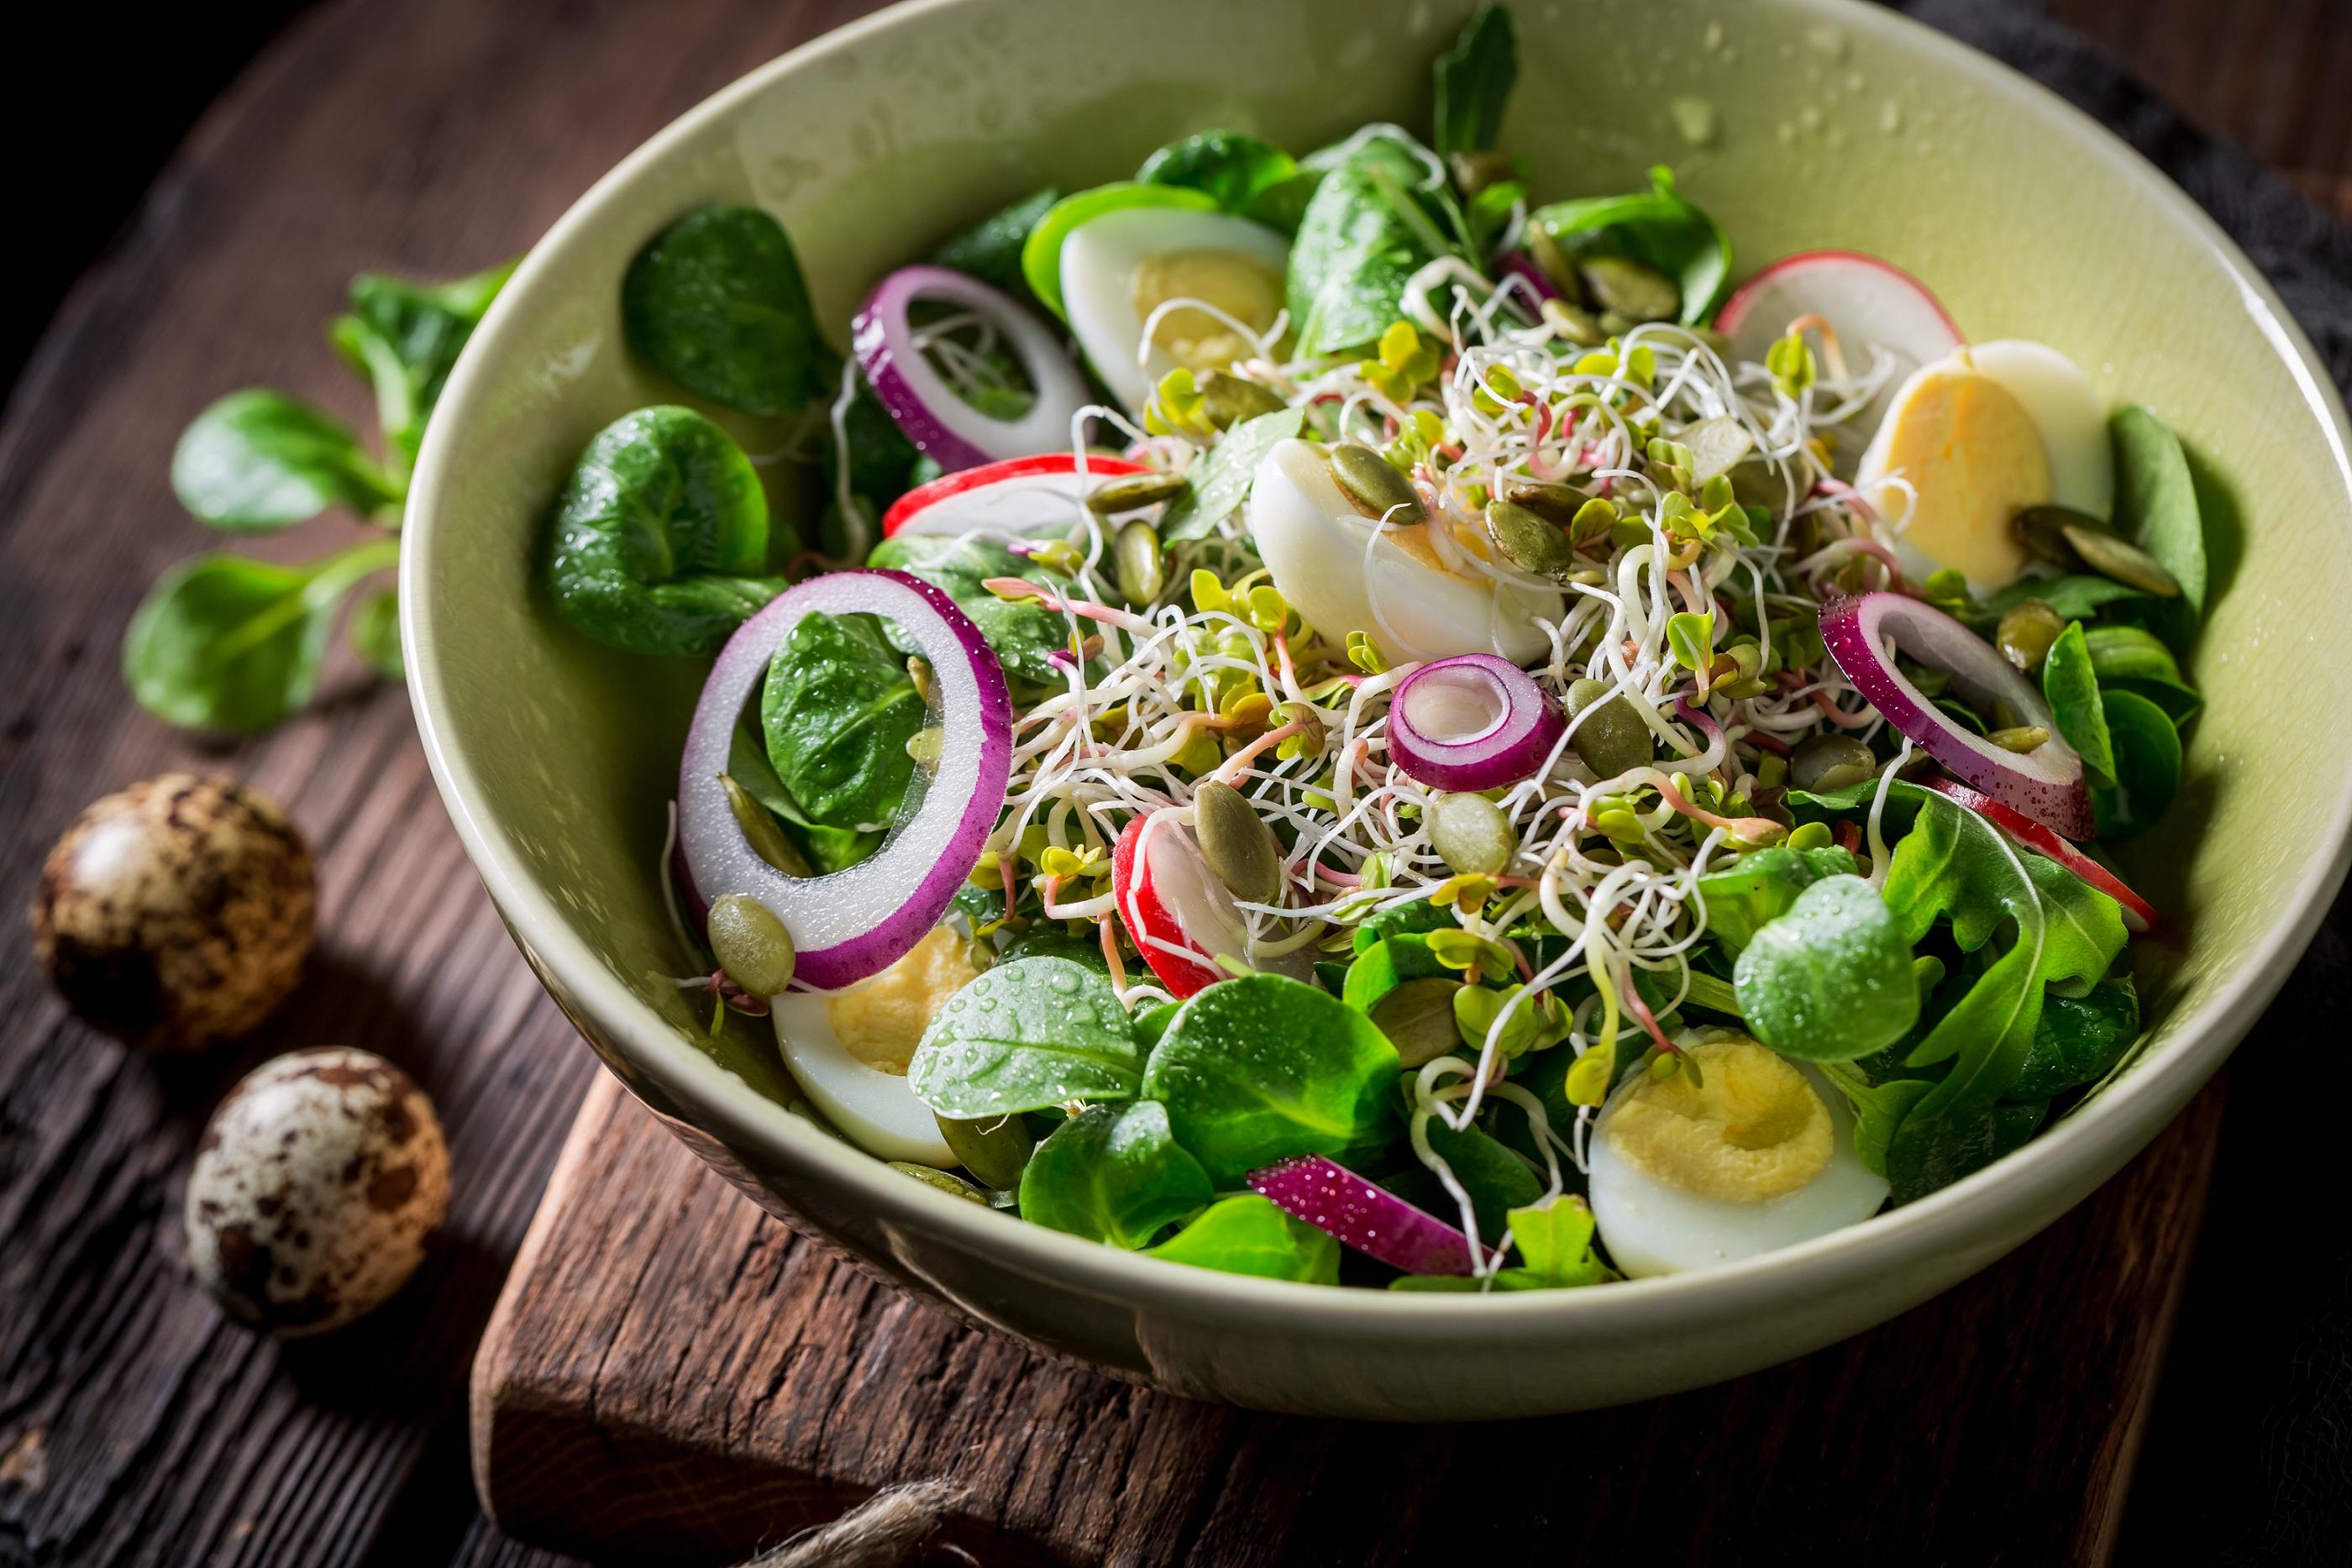 Daigai puikiai dera ivairiose salotose | V. Morkvėno nuotr.